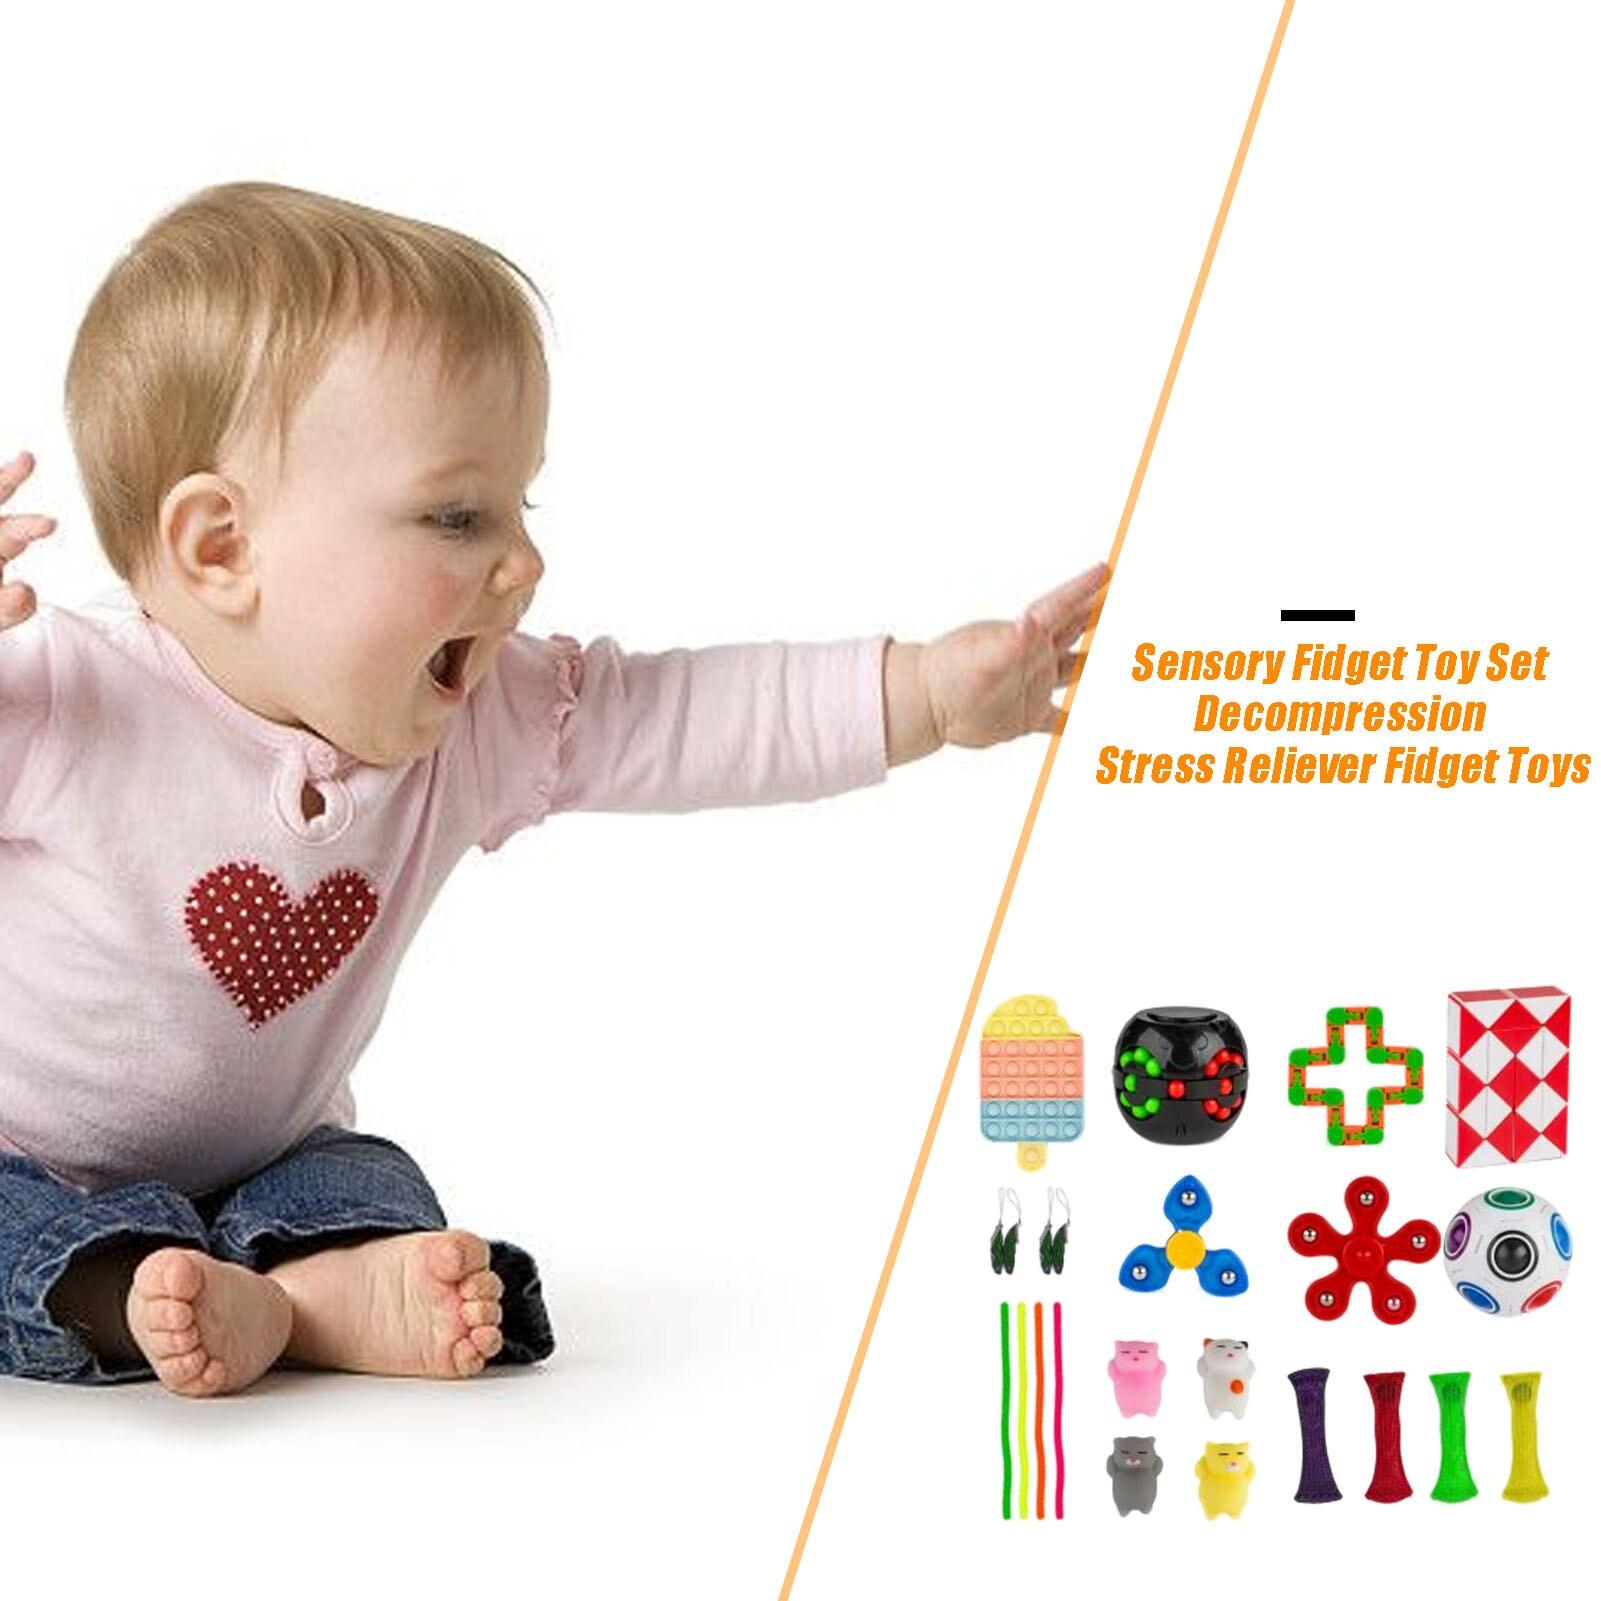 Sensory Fidget Toy Set Durable Decompression Stress Reliever Non-toxic Fidget Toys For Children Adults enlarge